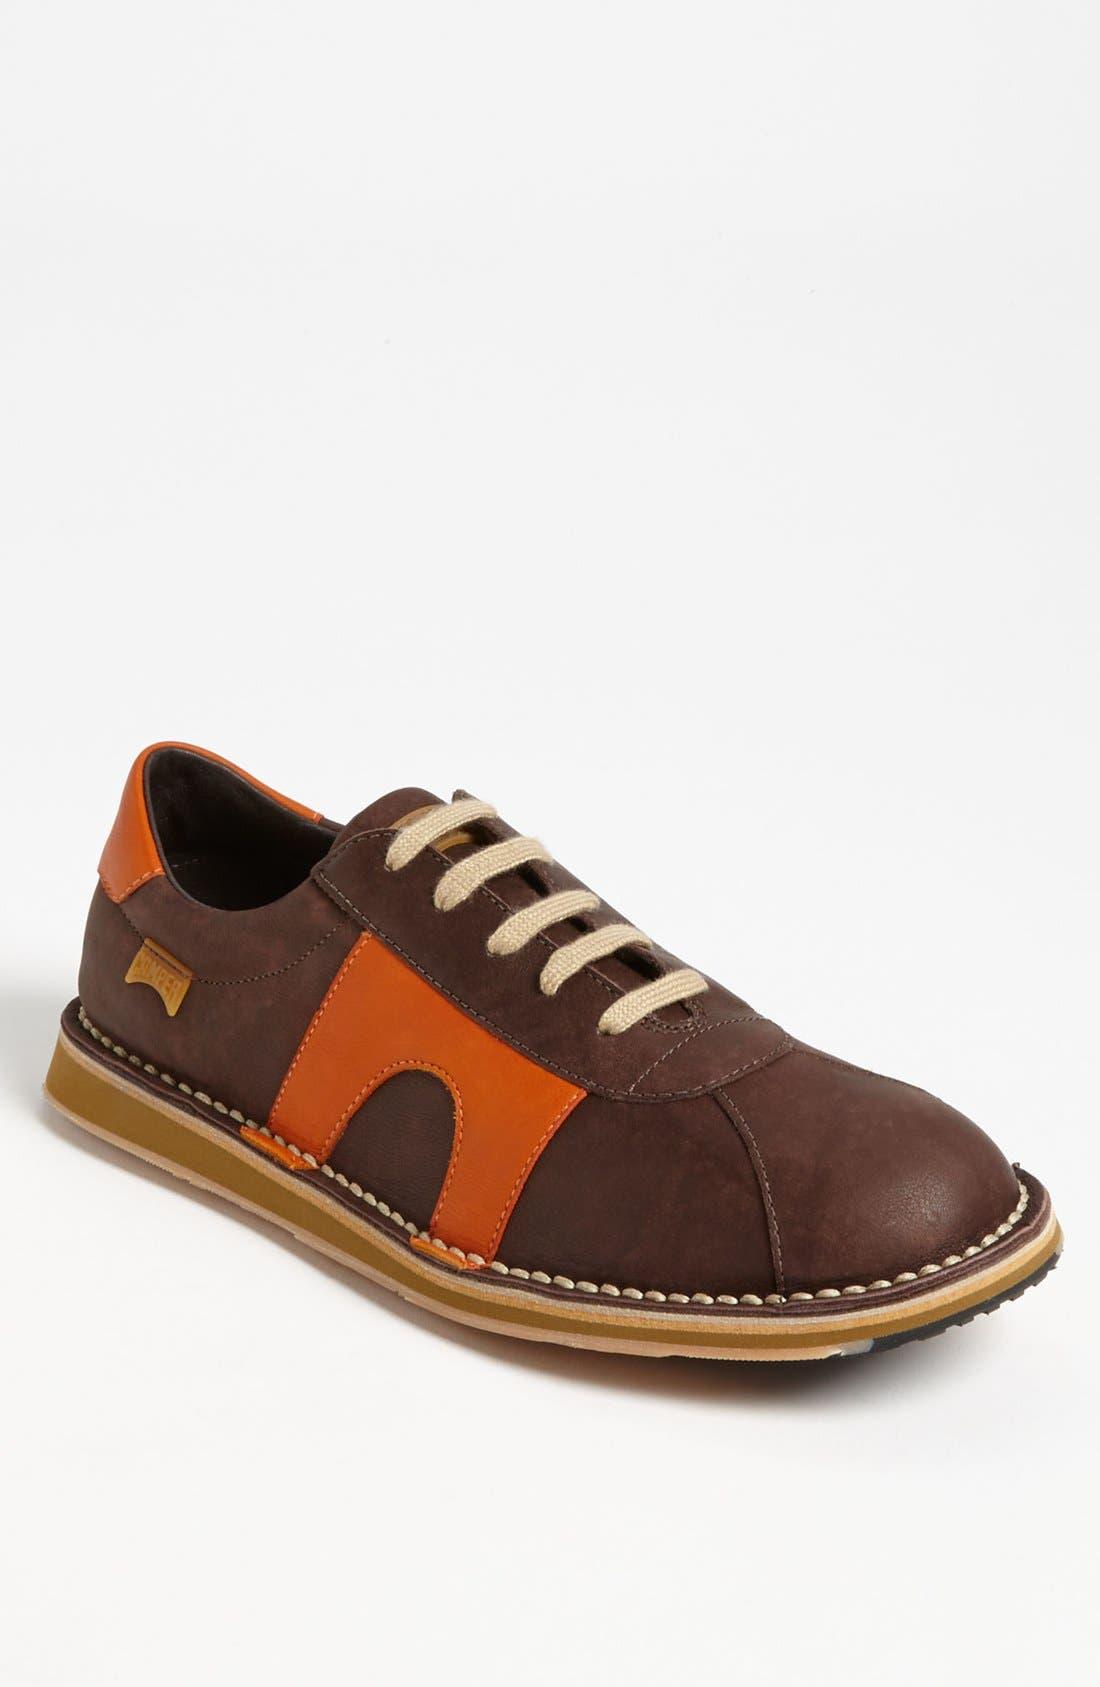 Main Image - Camper 'Brothers' Sneaker